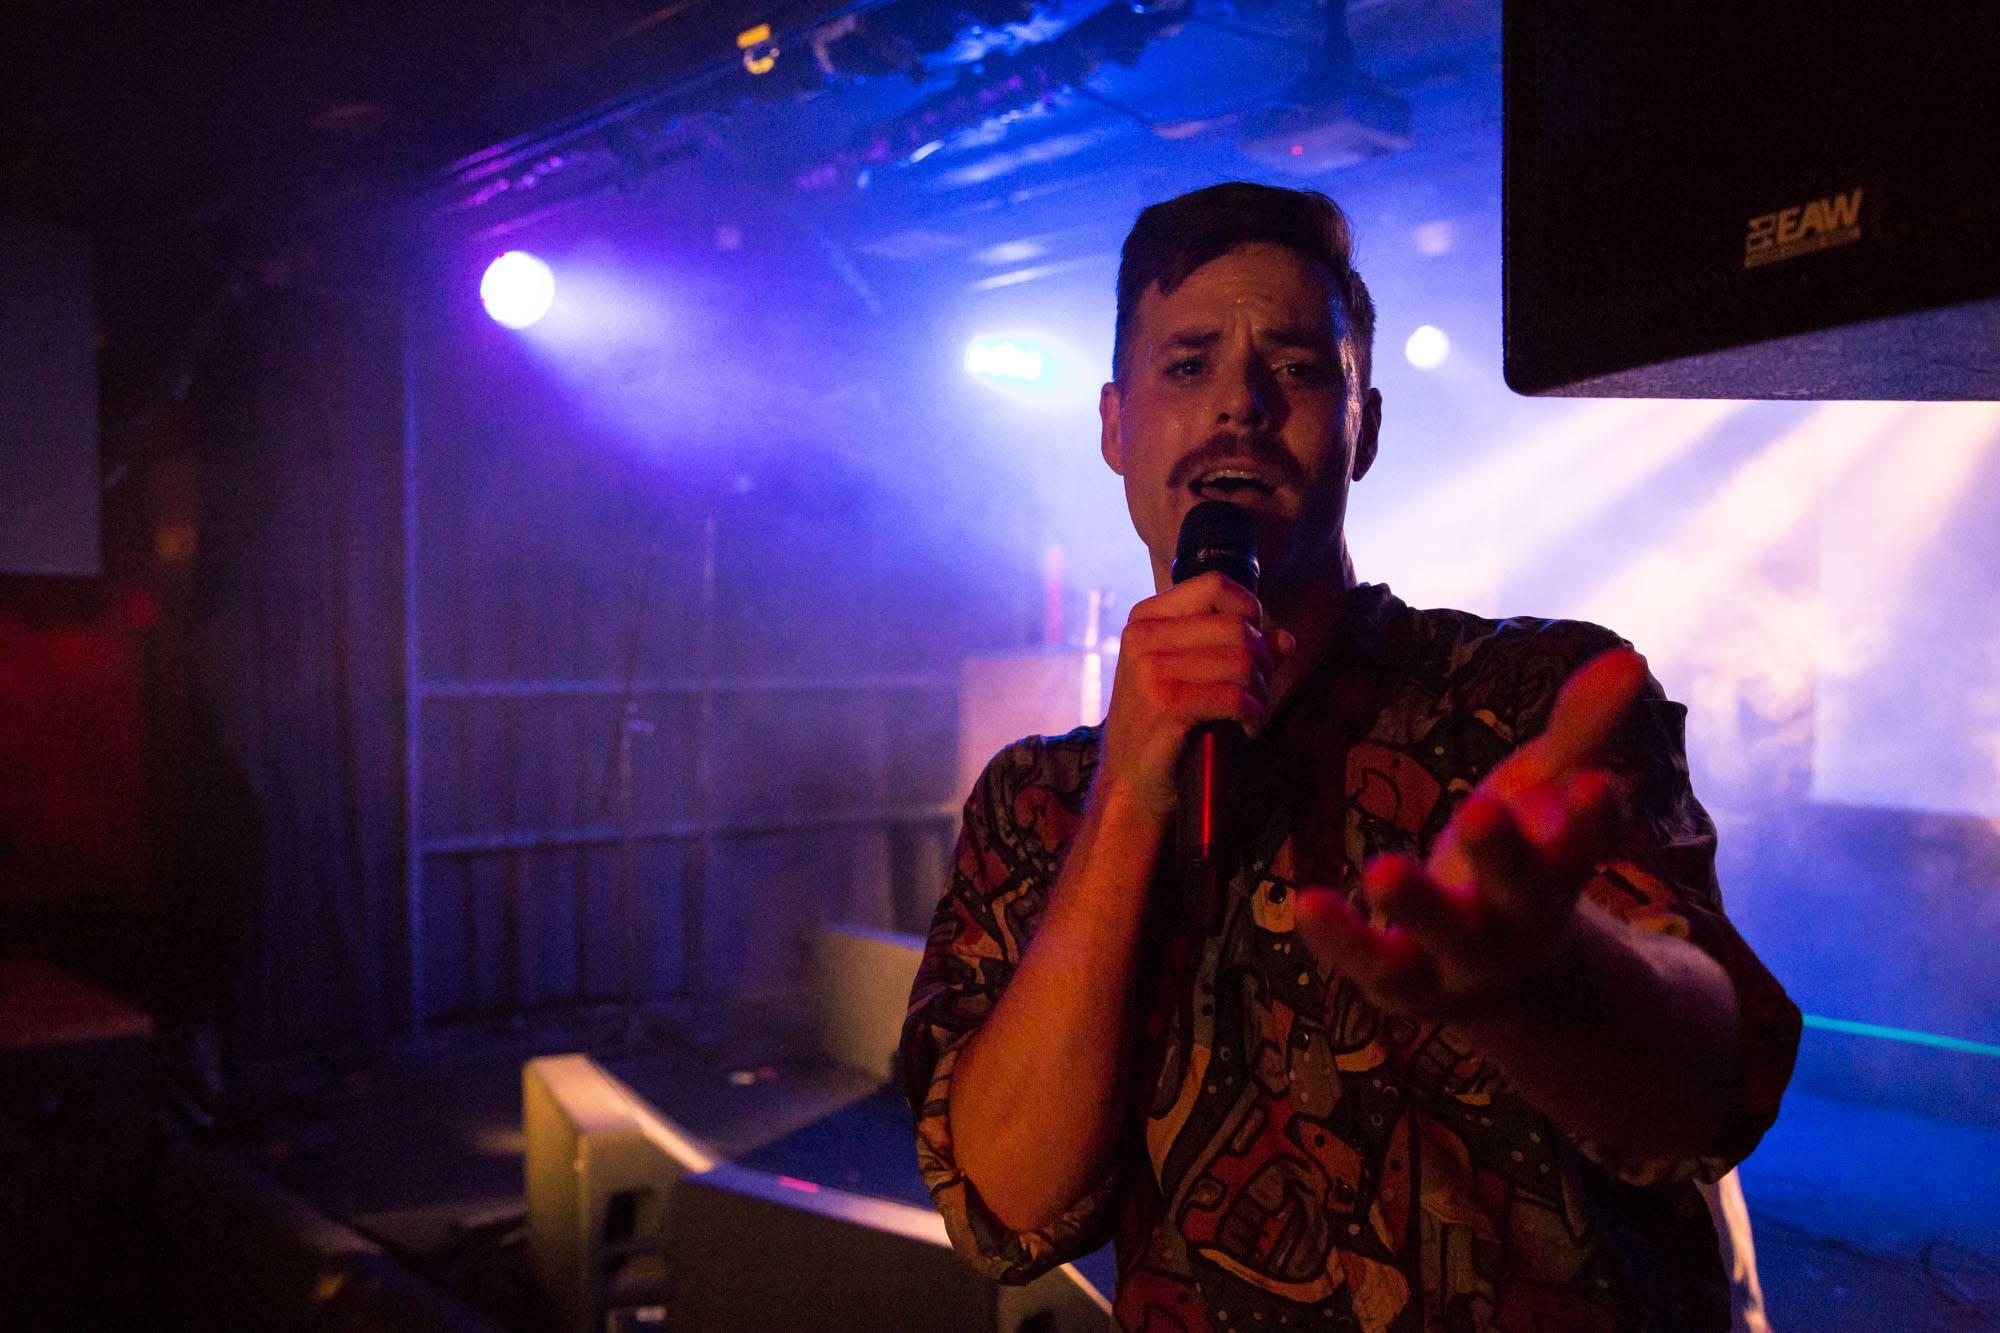 Mark Mills at the Biltmore Cabaret, Vancouver, Nov 4 2017. Kirk Chantraine photo.